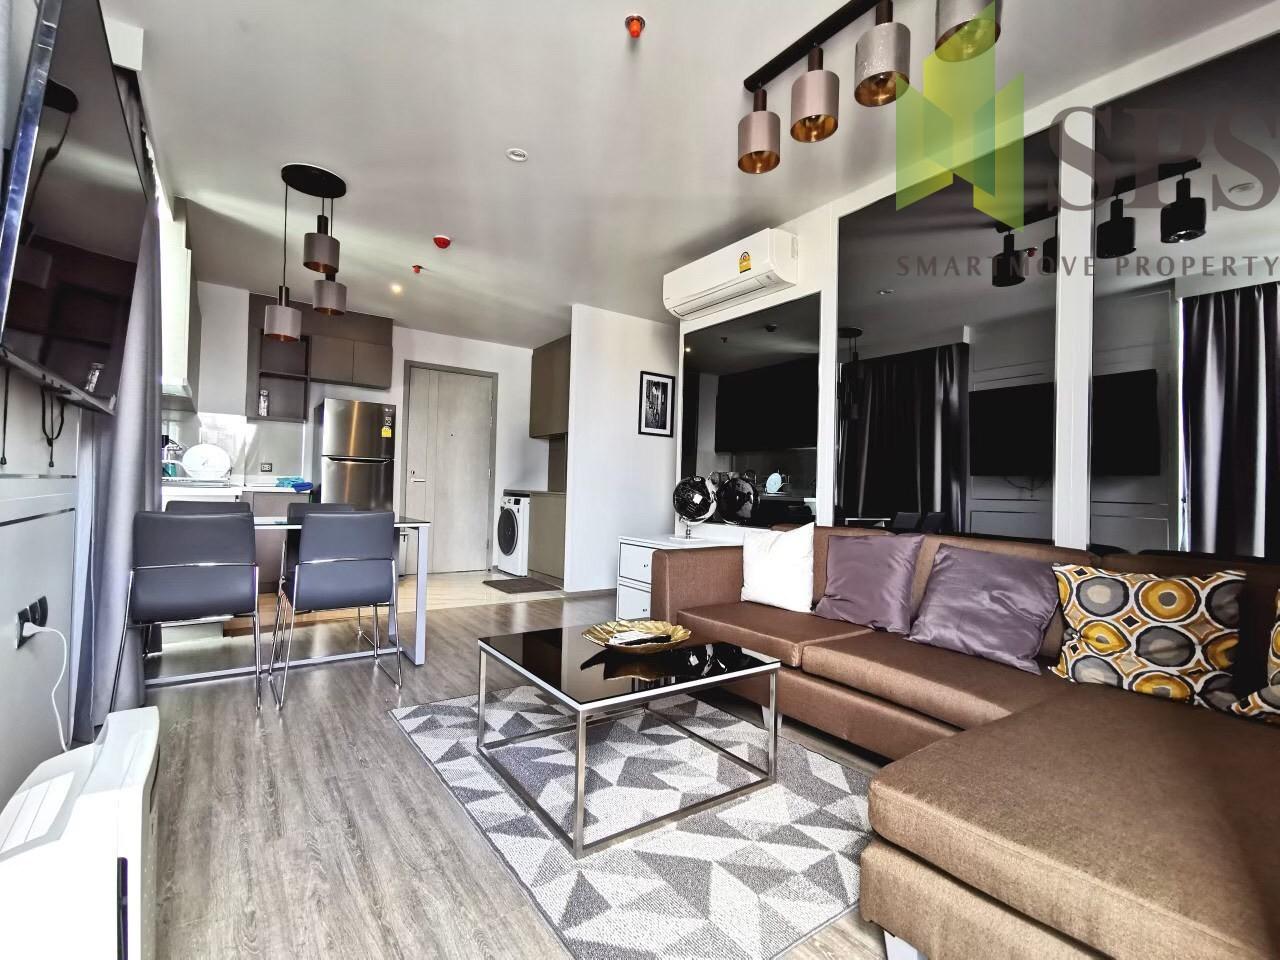 Condo For Rent at Rhythm Ekkamai (Property ID: SPS-PP298)